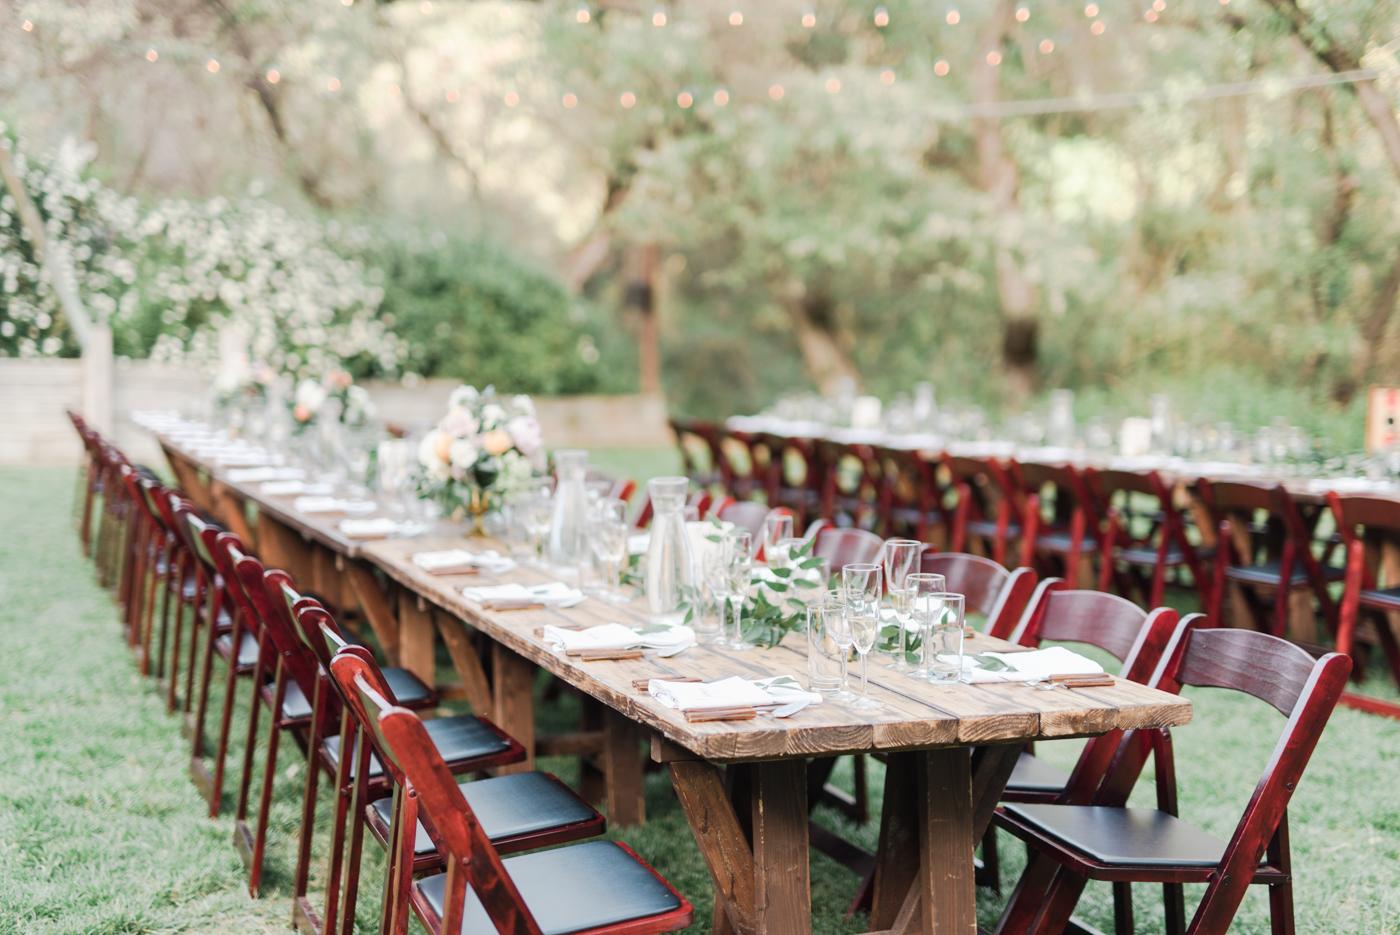 l&c-the_1909_spring_garden_wedding_los_angeles_fine_art_wedding_photographer-30.jpg